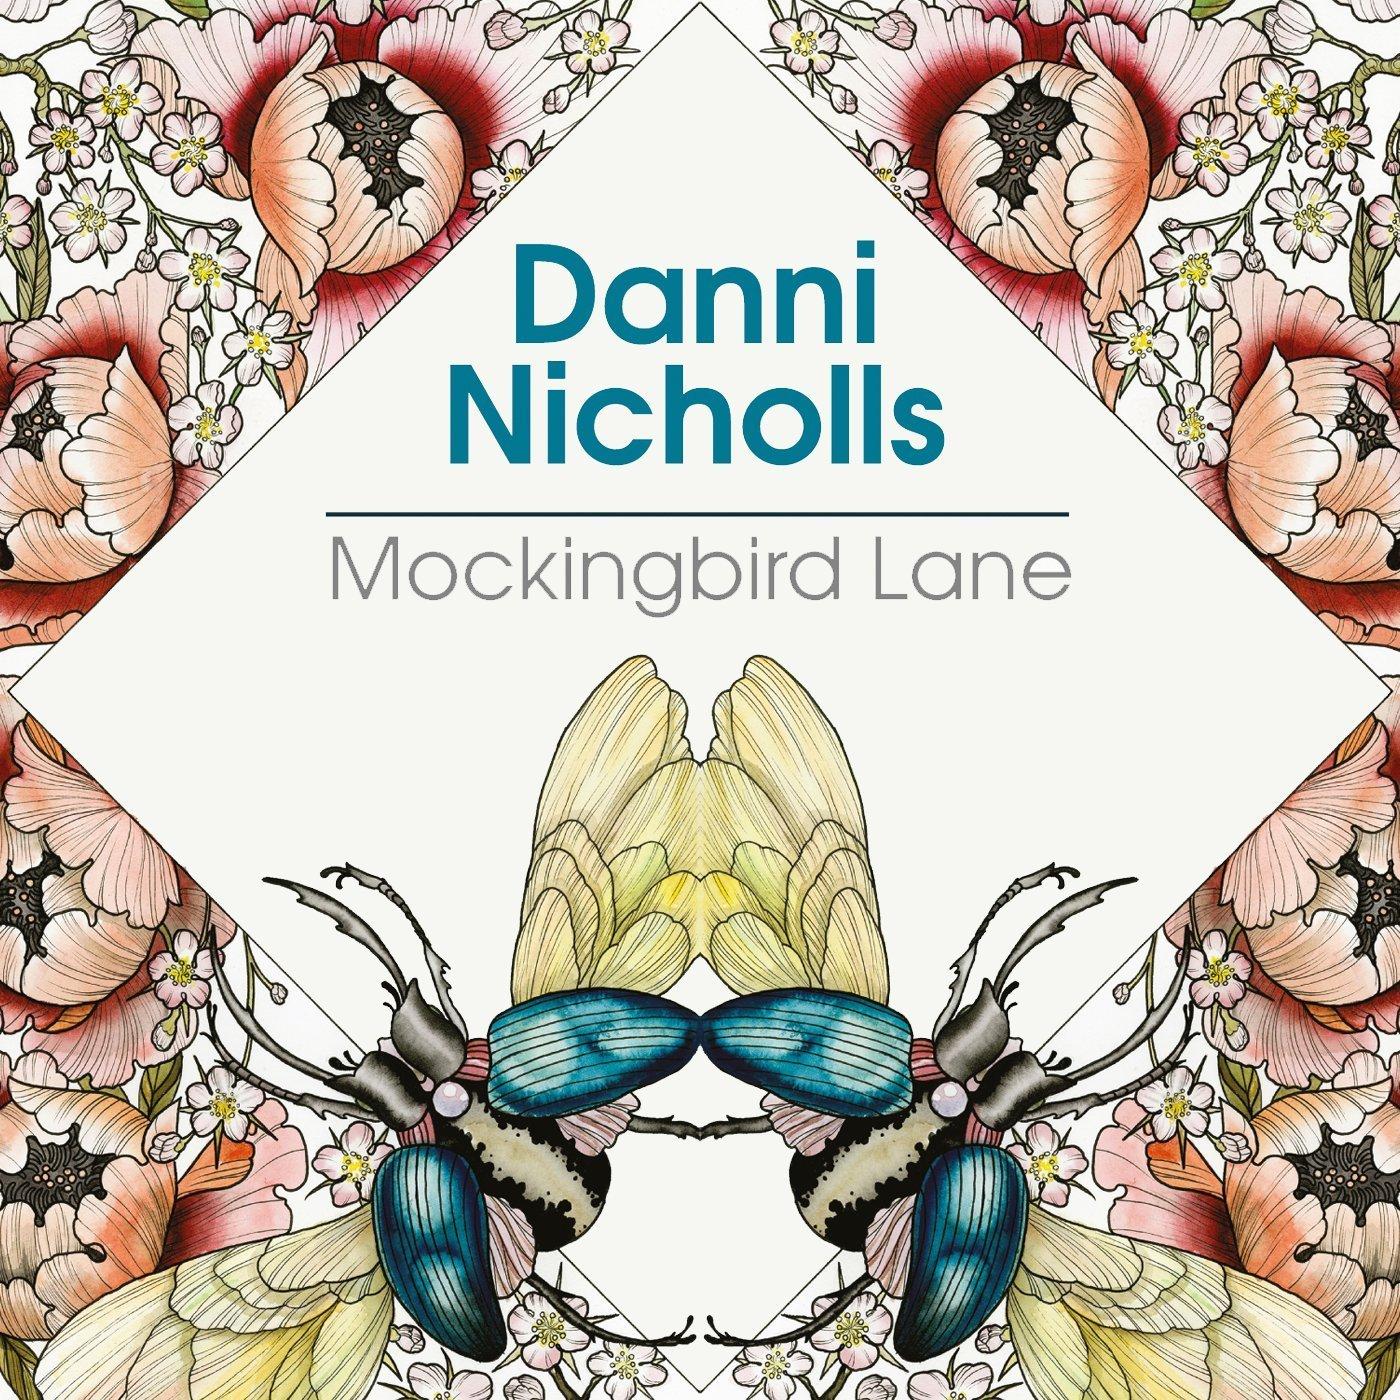 Danni Nicholls singer song writer MBL Cover